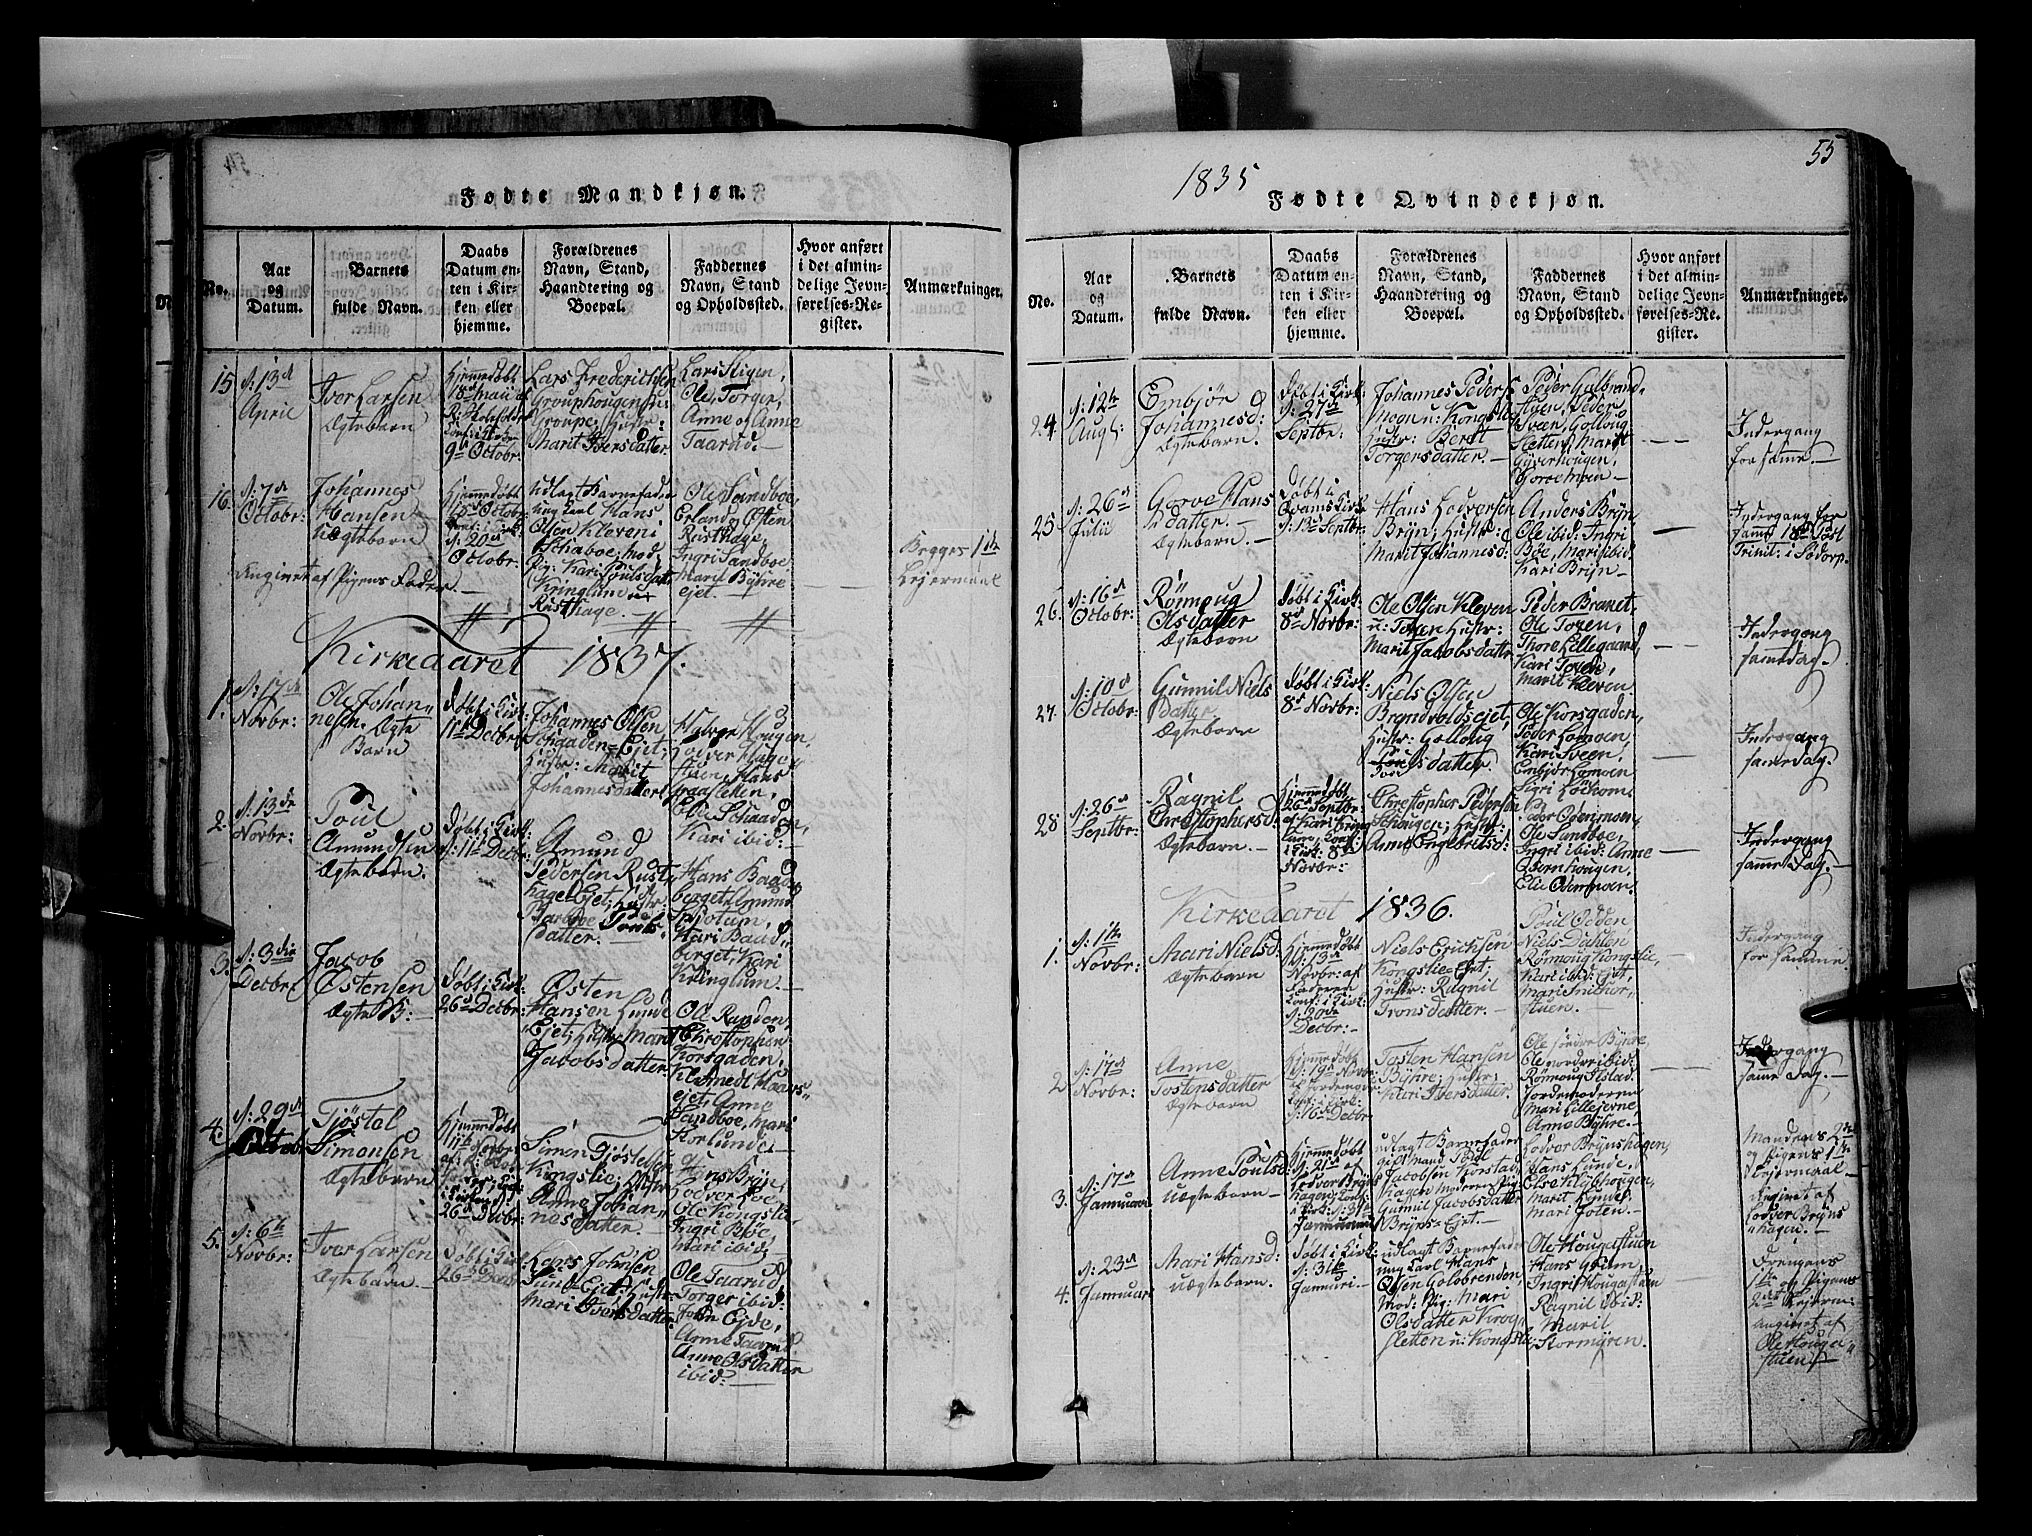 SAH, Fron prestekontor, H/Ha/Hab/L0004: Klokkerbok nr. 4, 1816-1850, s. 55